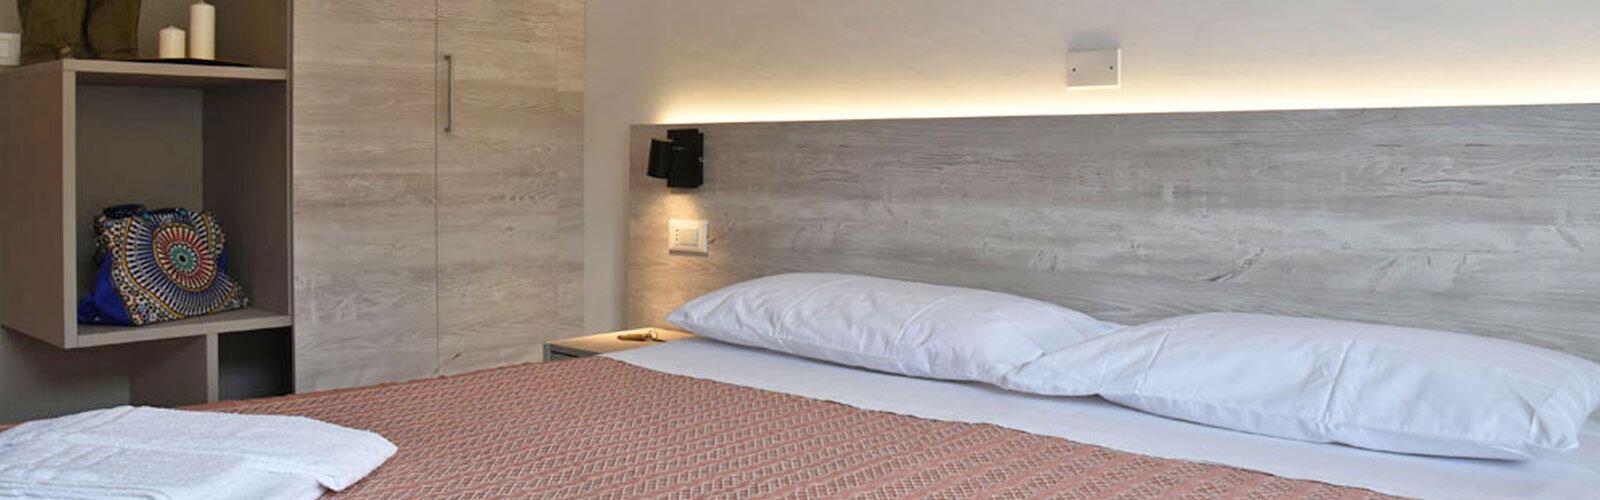 hotellaninfea en the-rooms 002